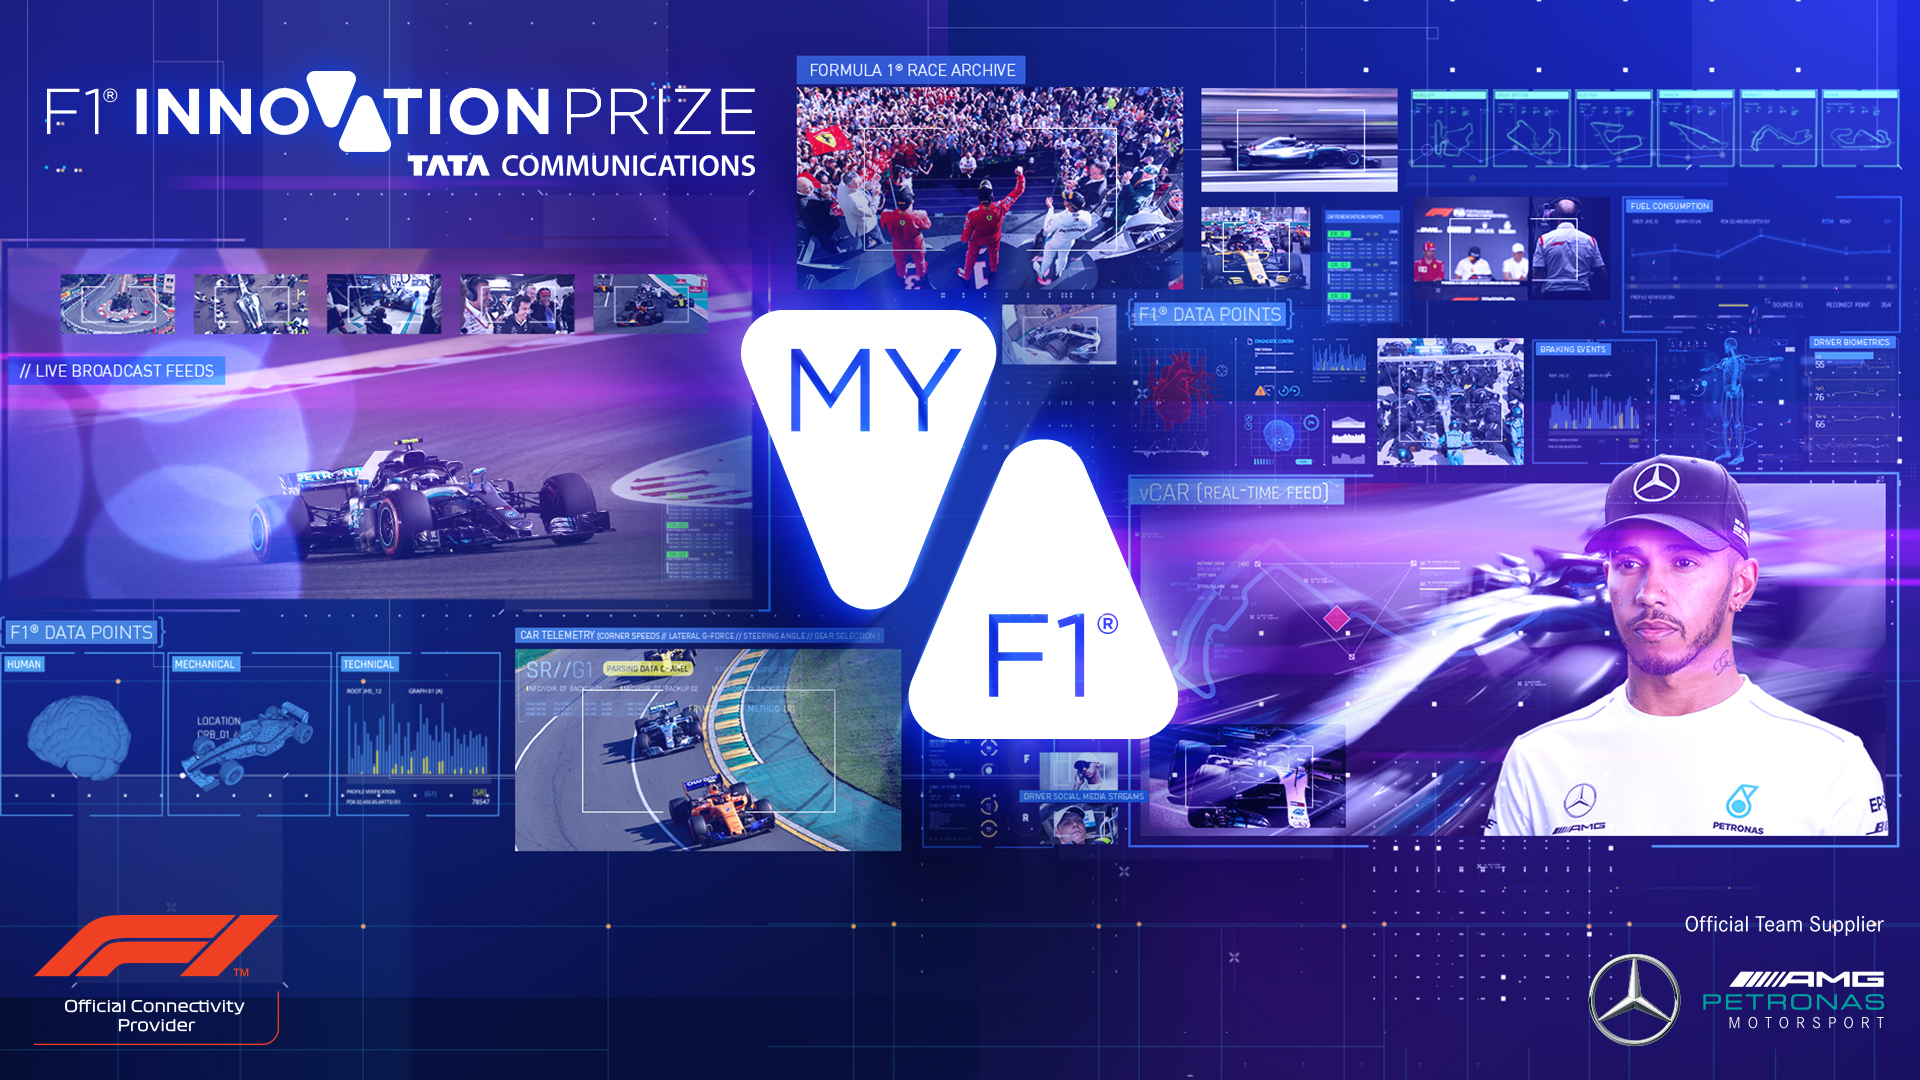 Mercedes-AMG Petronas Motorsport Driver and four-time FIA Formula 1® Drivers' World Champion, Lewis Hamilton